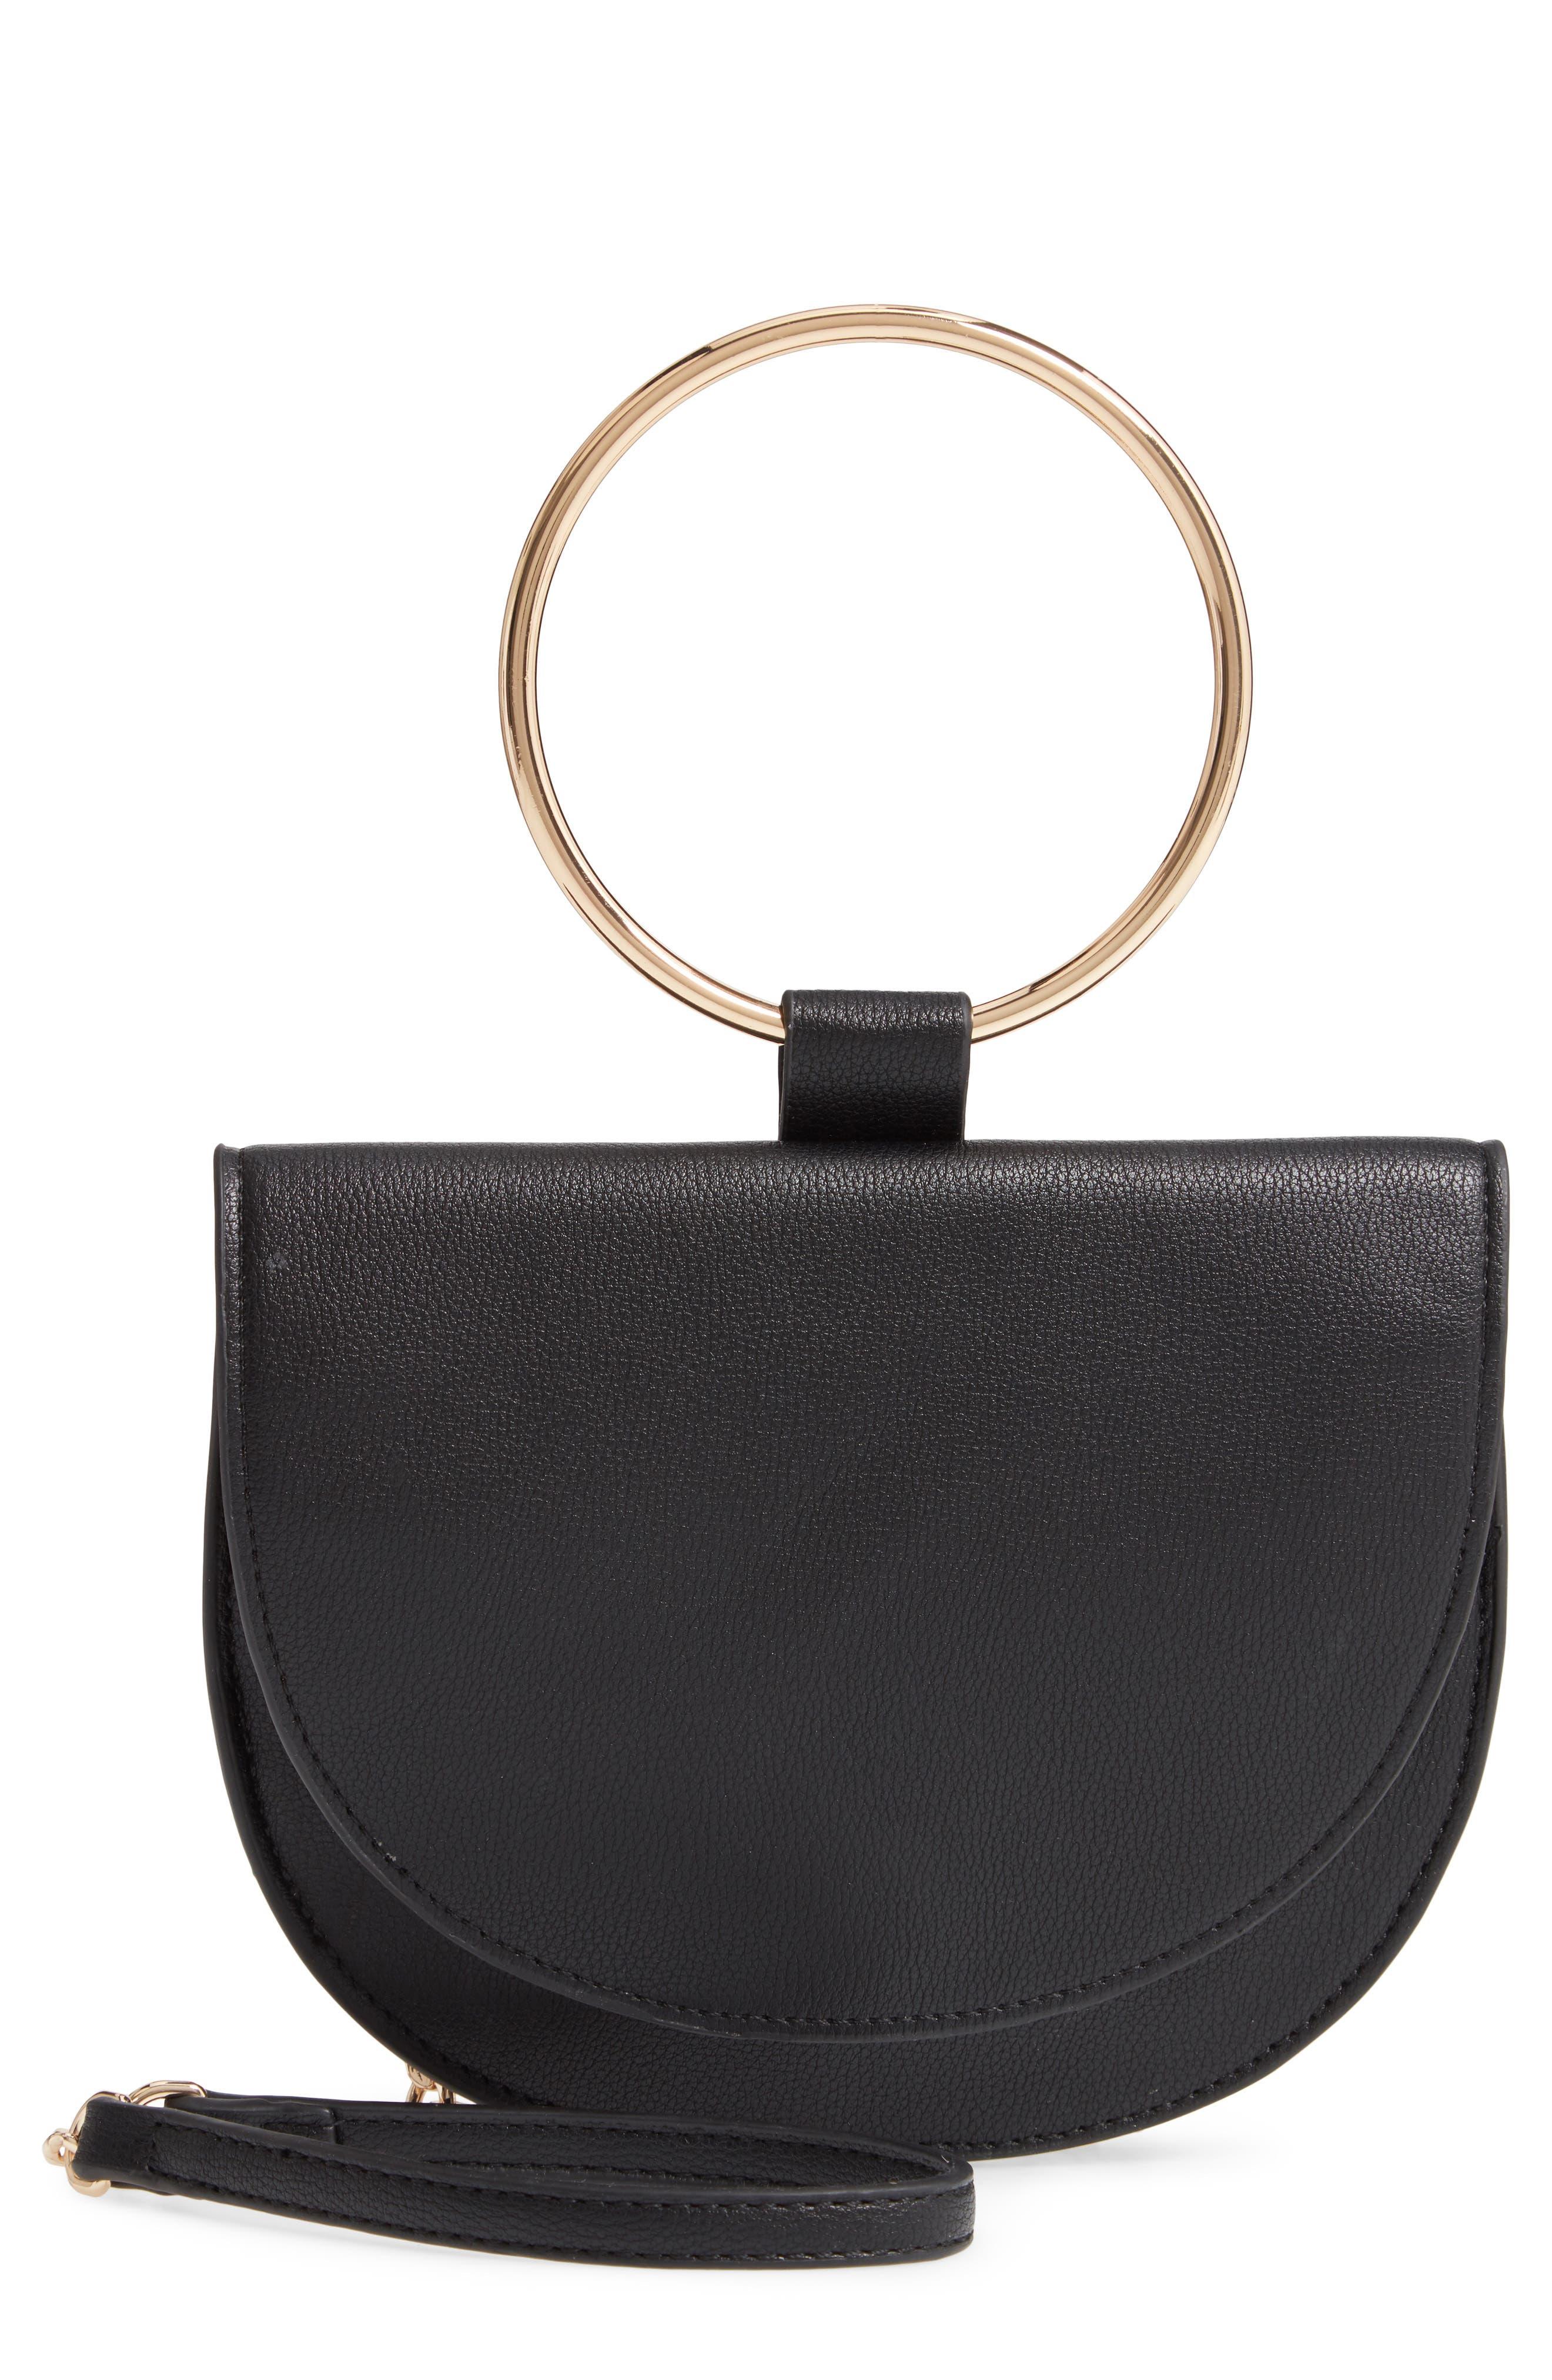 TROUVÉ, Reese Faux Leather Ring Crossbody Bag, Main thumbnail 1, color, BLACK